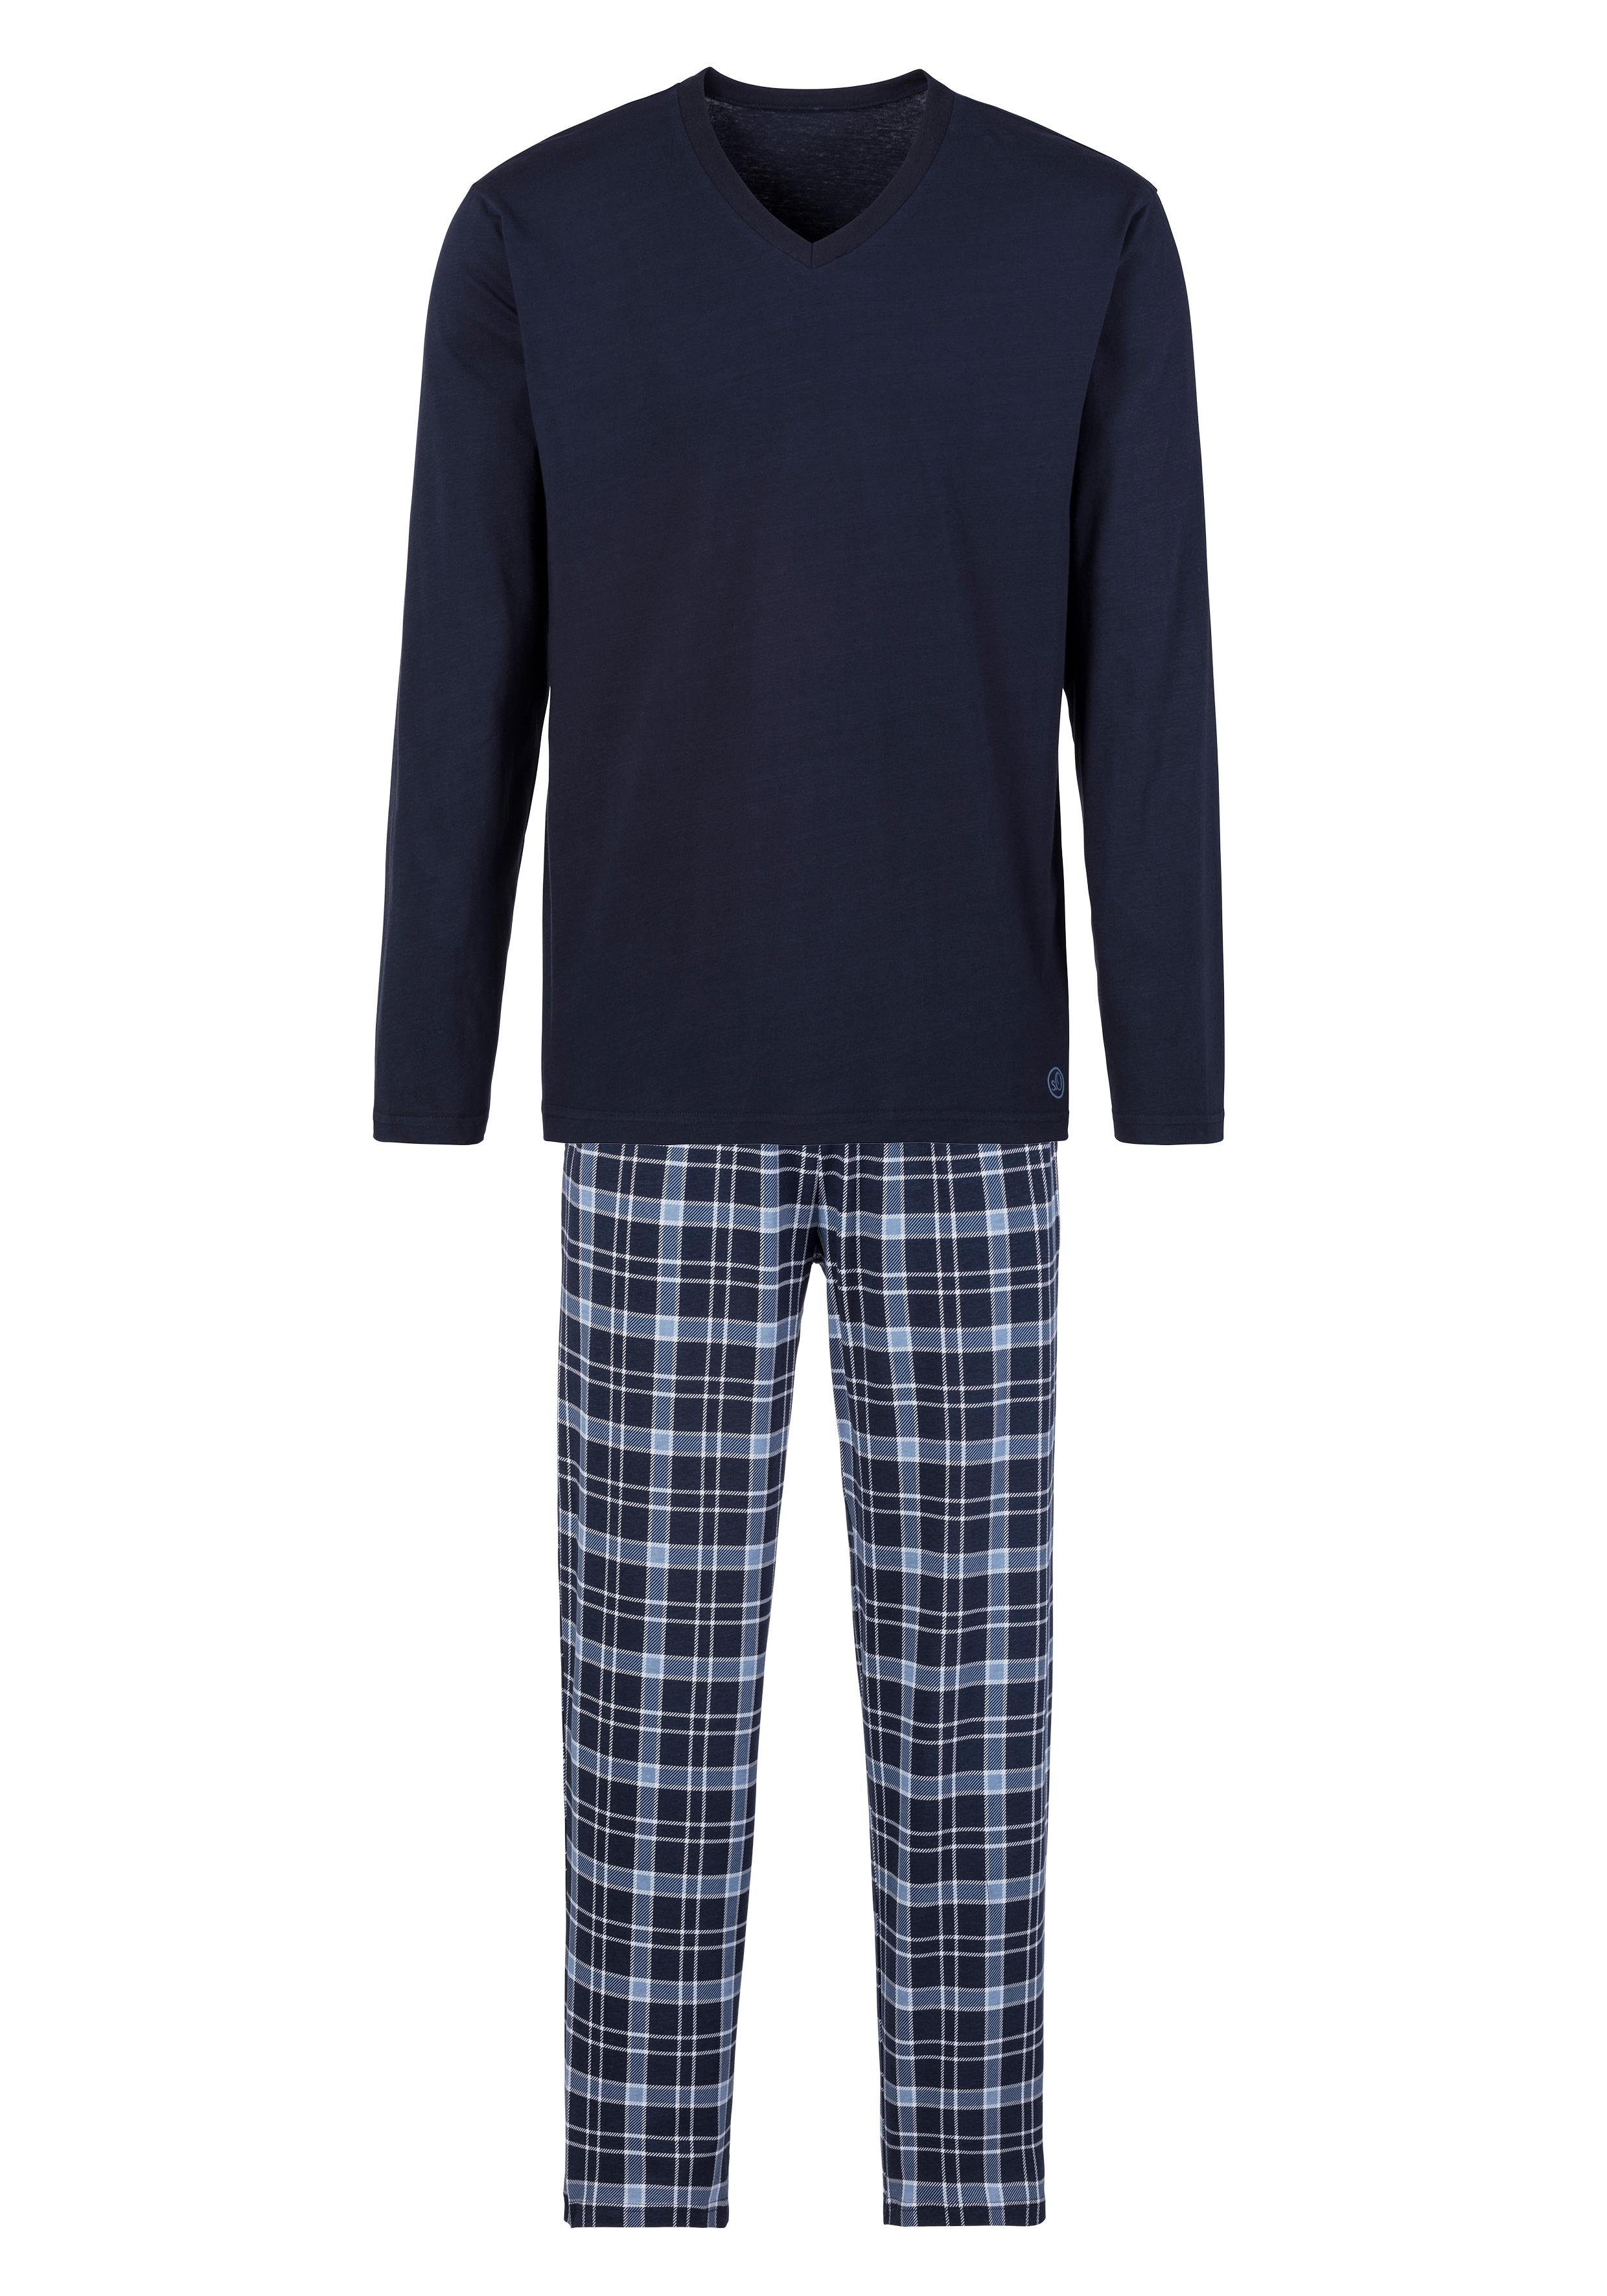 s.Oliver Bodywear Pyjama, mit Karo Hose